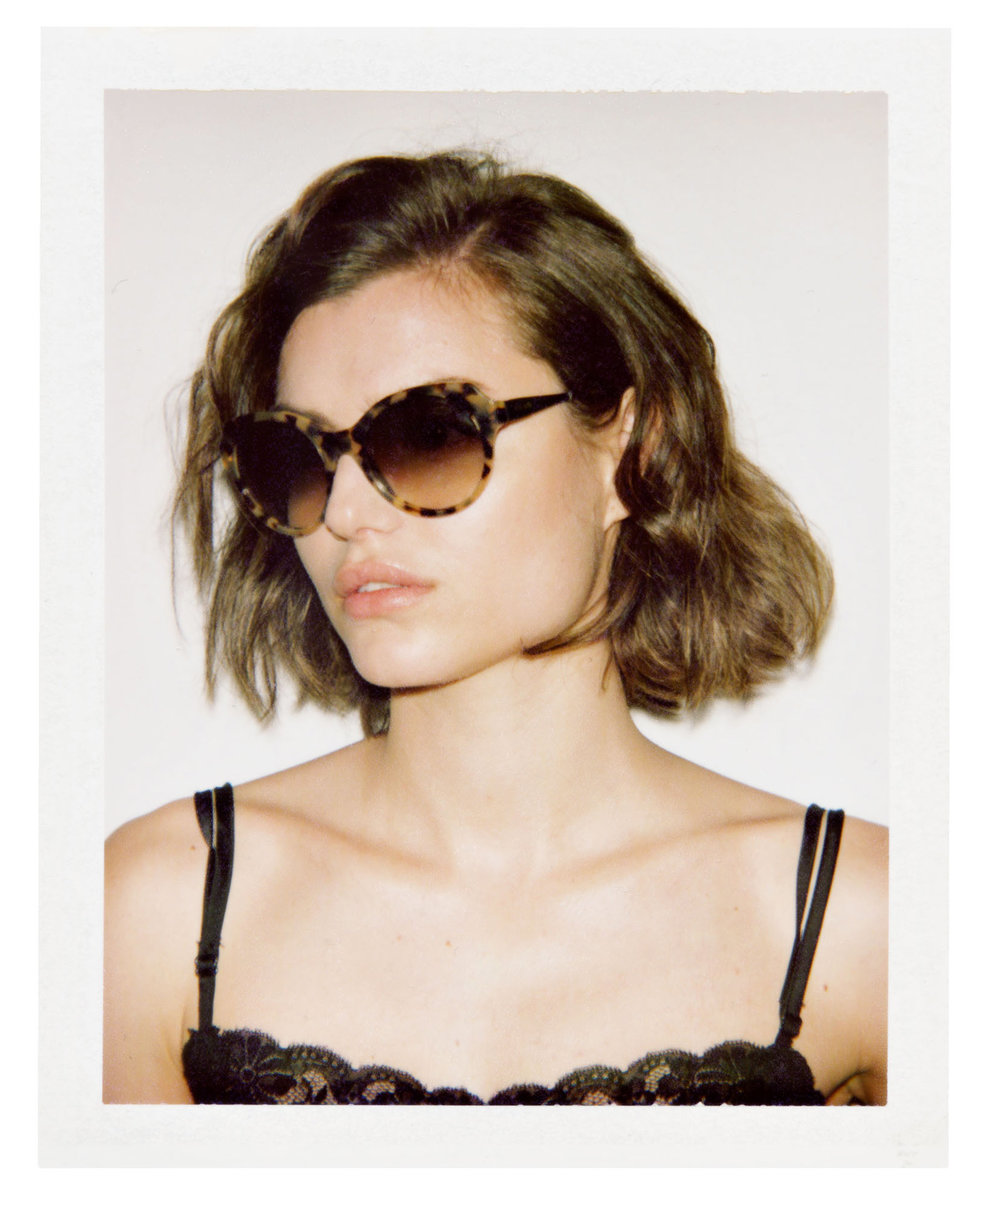 Emilia_Vuciniv_Models_dot_22_web-1600_16.jpg